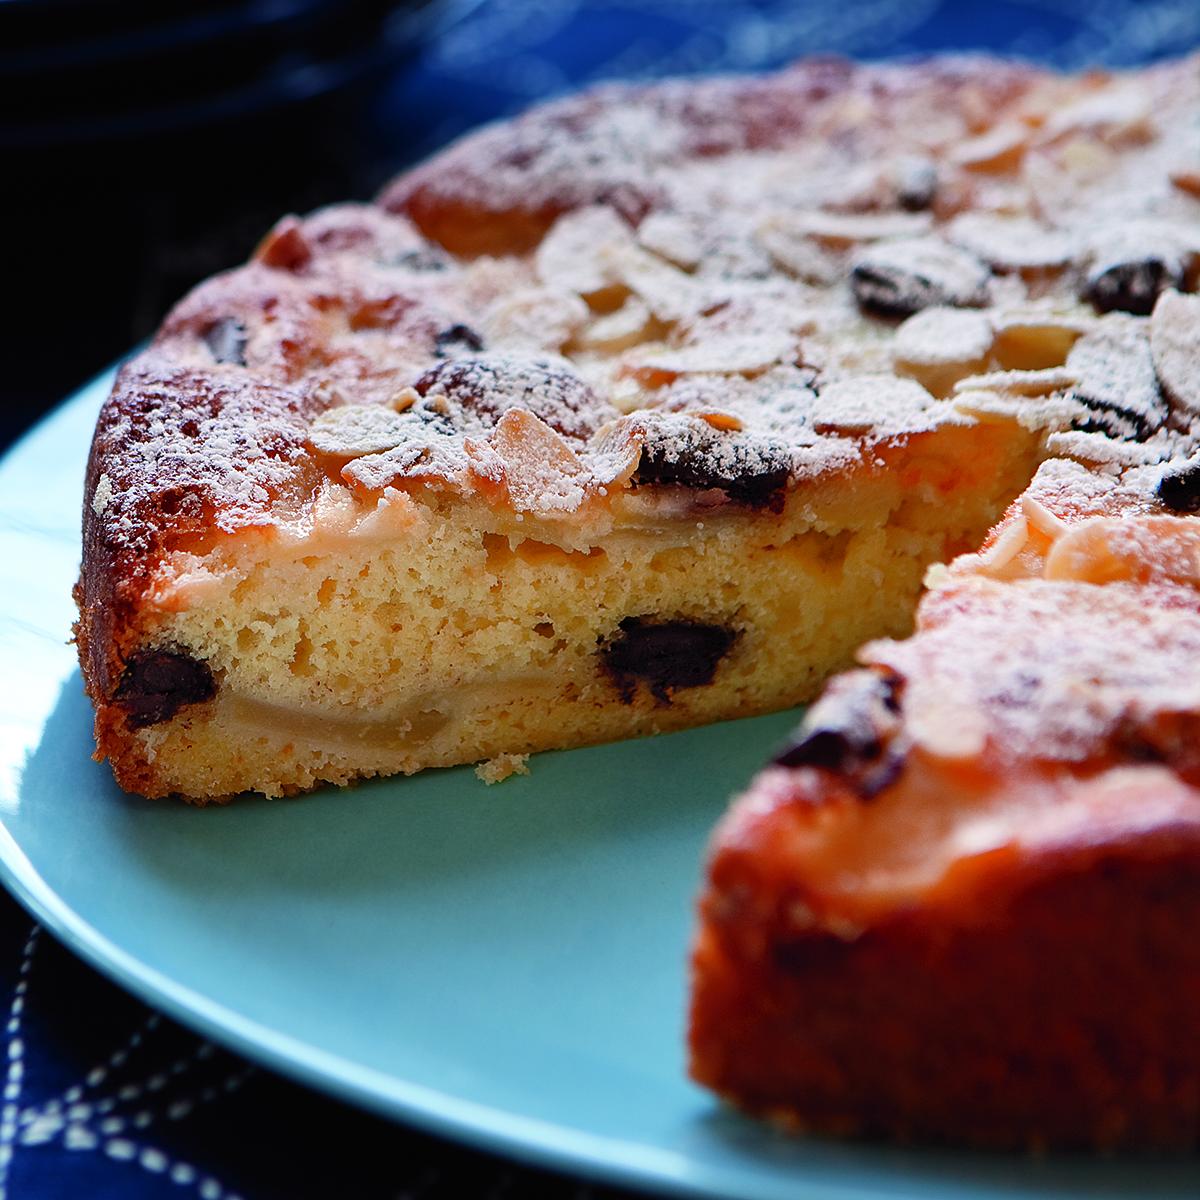 Pear-Almond Cake with Chocolate Chunks